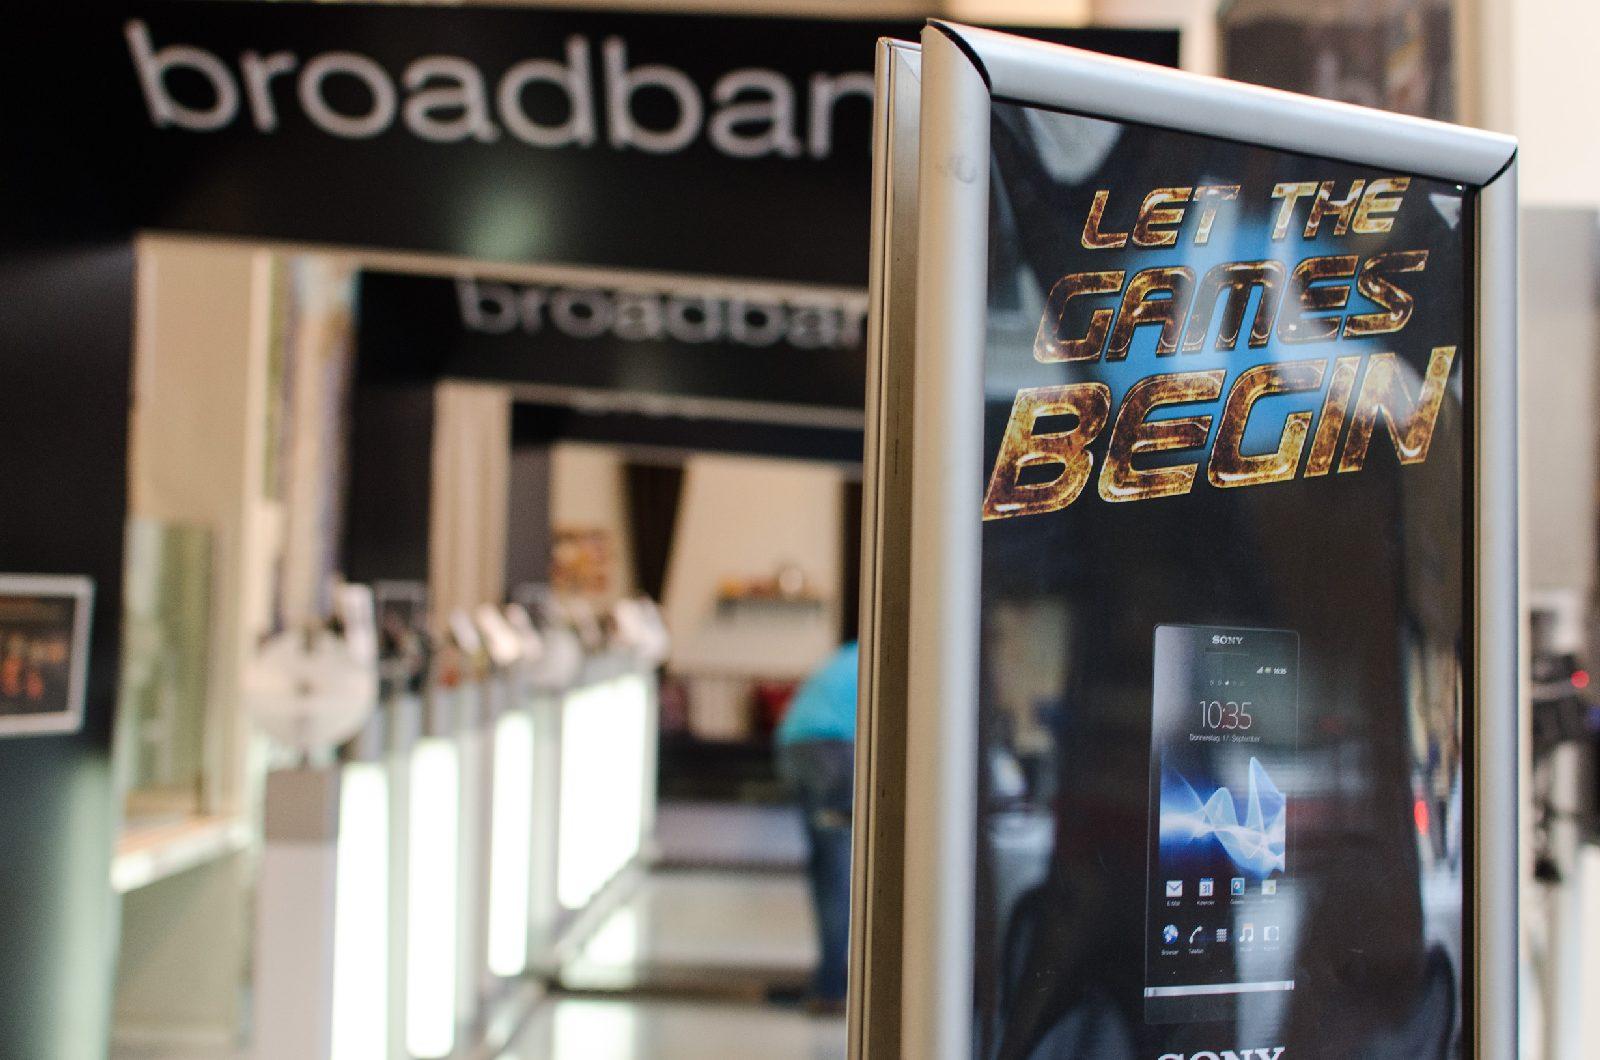 Sony Let the Games Begin – Jocurile, o prioritate pentru companie